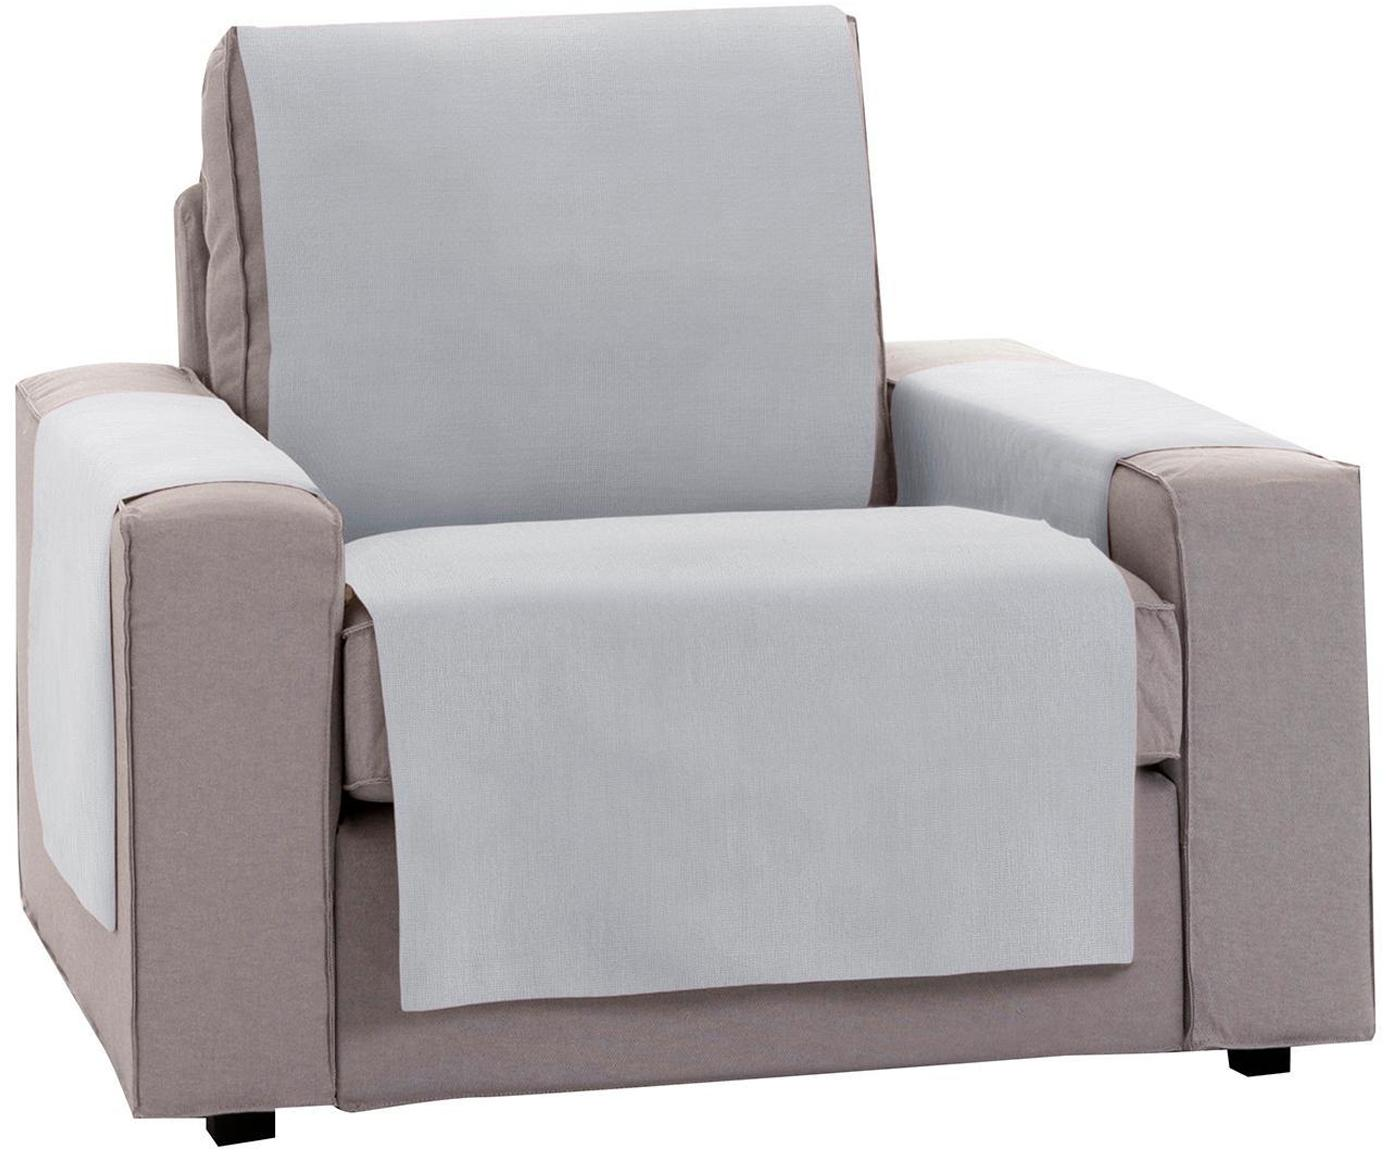 Funda de sillón Levante, 50%algodón, 50%poliéster, Gris, An 55 x L 220 cm